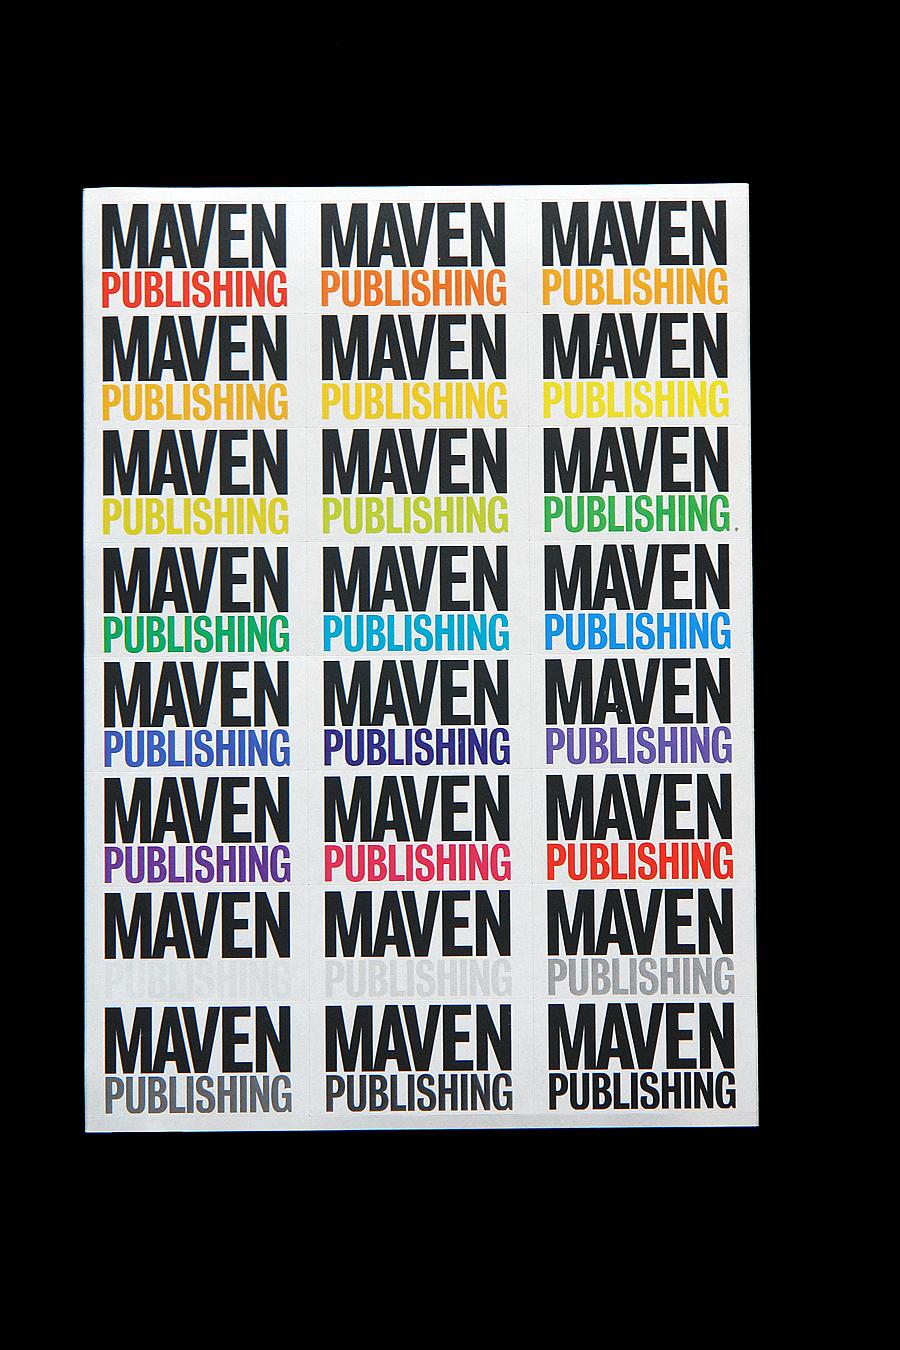 Matthijs Matt van Leeuwen, Maven Publishing, Identity, Logo, Sander Ruys, G2K Designers Amsterdam